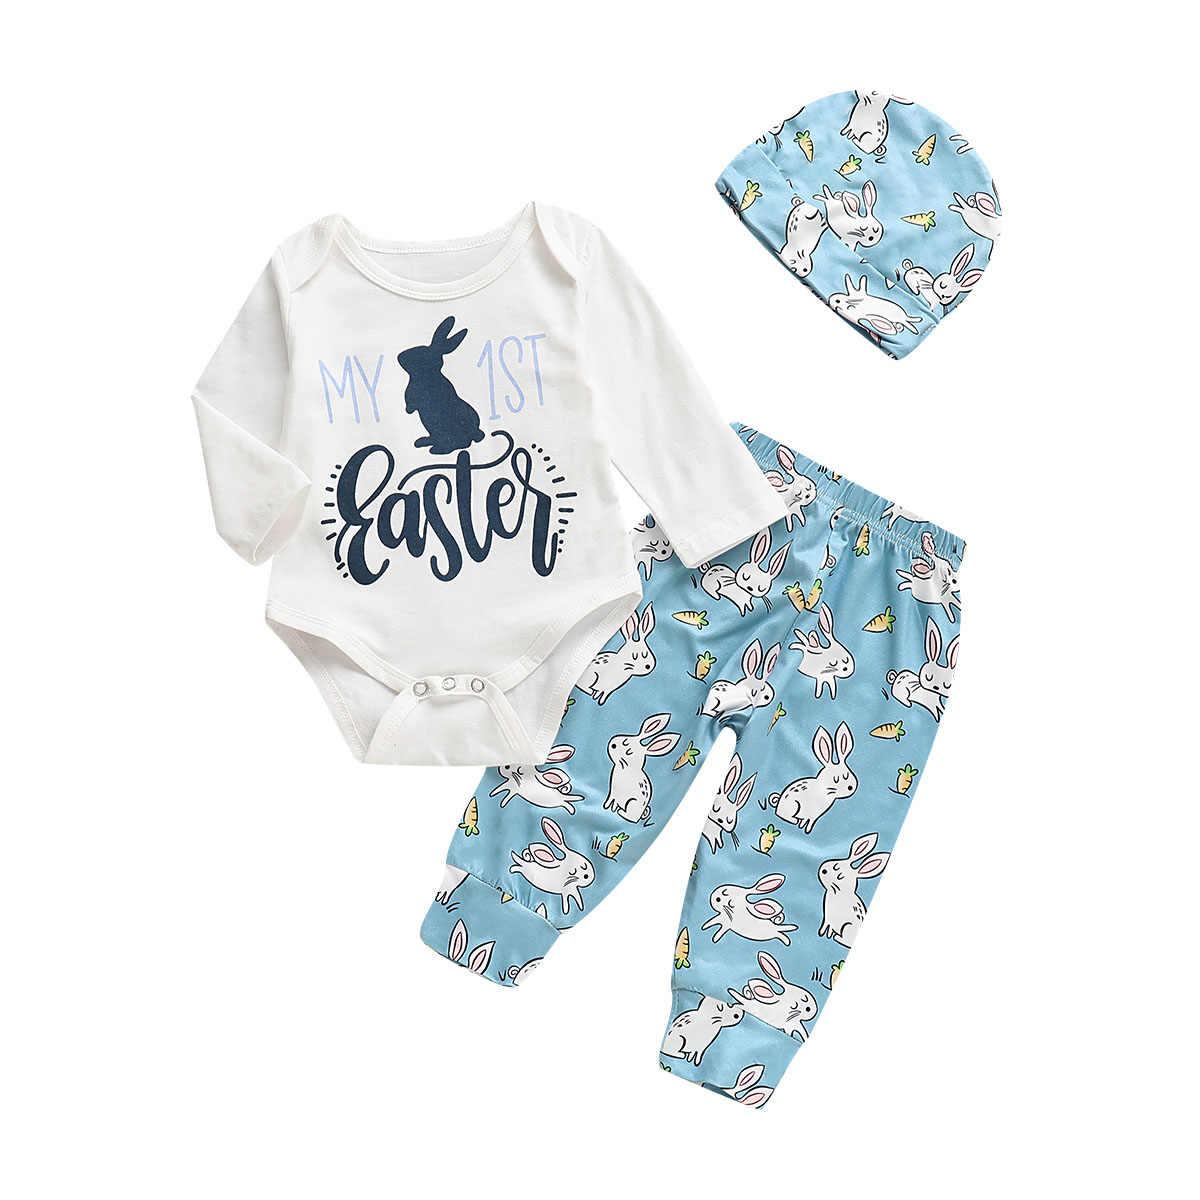 c34b5b6f9 My 1st Easter Newborn Infant Baby Boy Girl Long Sleeve Cotton Bodysuit Tops  Rabbit Print Long